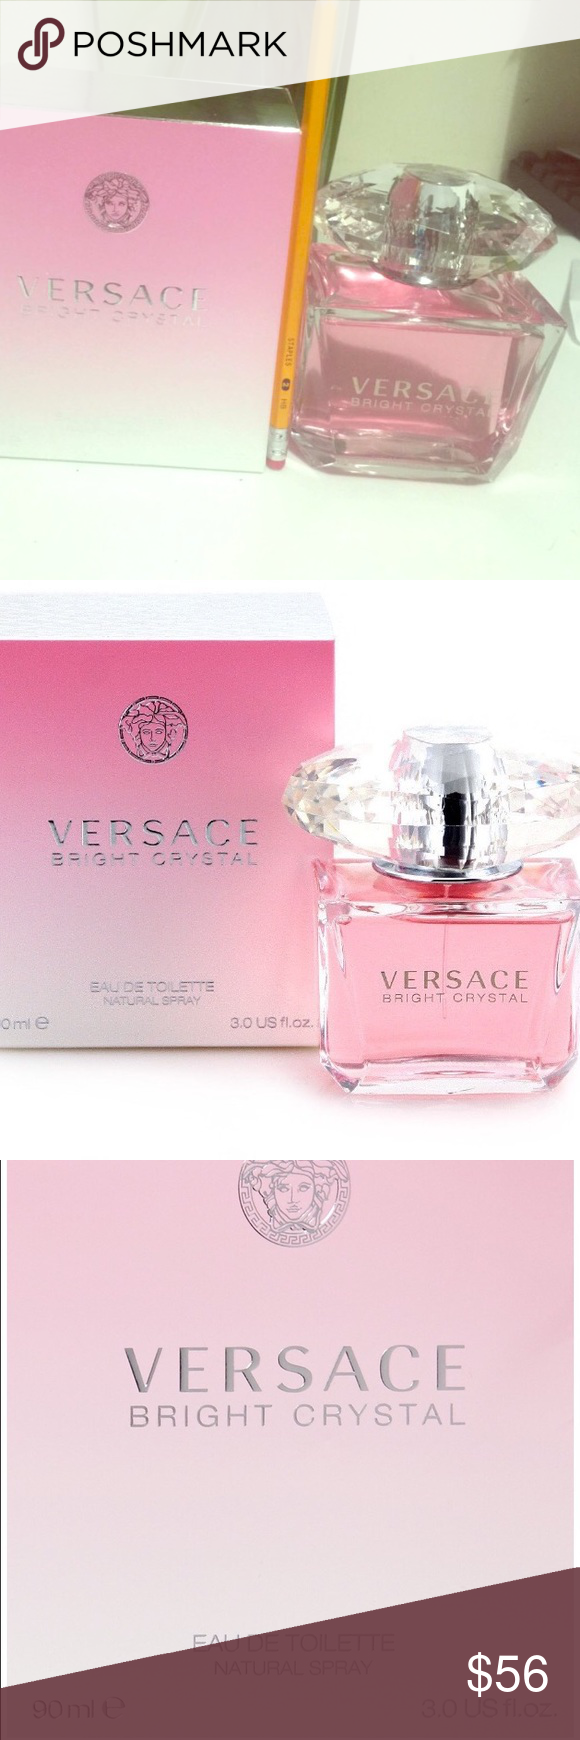 Versace Bright Crystal Versace Bright Crystal By Gianni Versace Versace Other Versace Bright Crystal Crystals Fashion Design